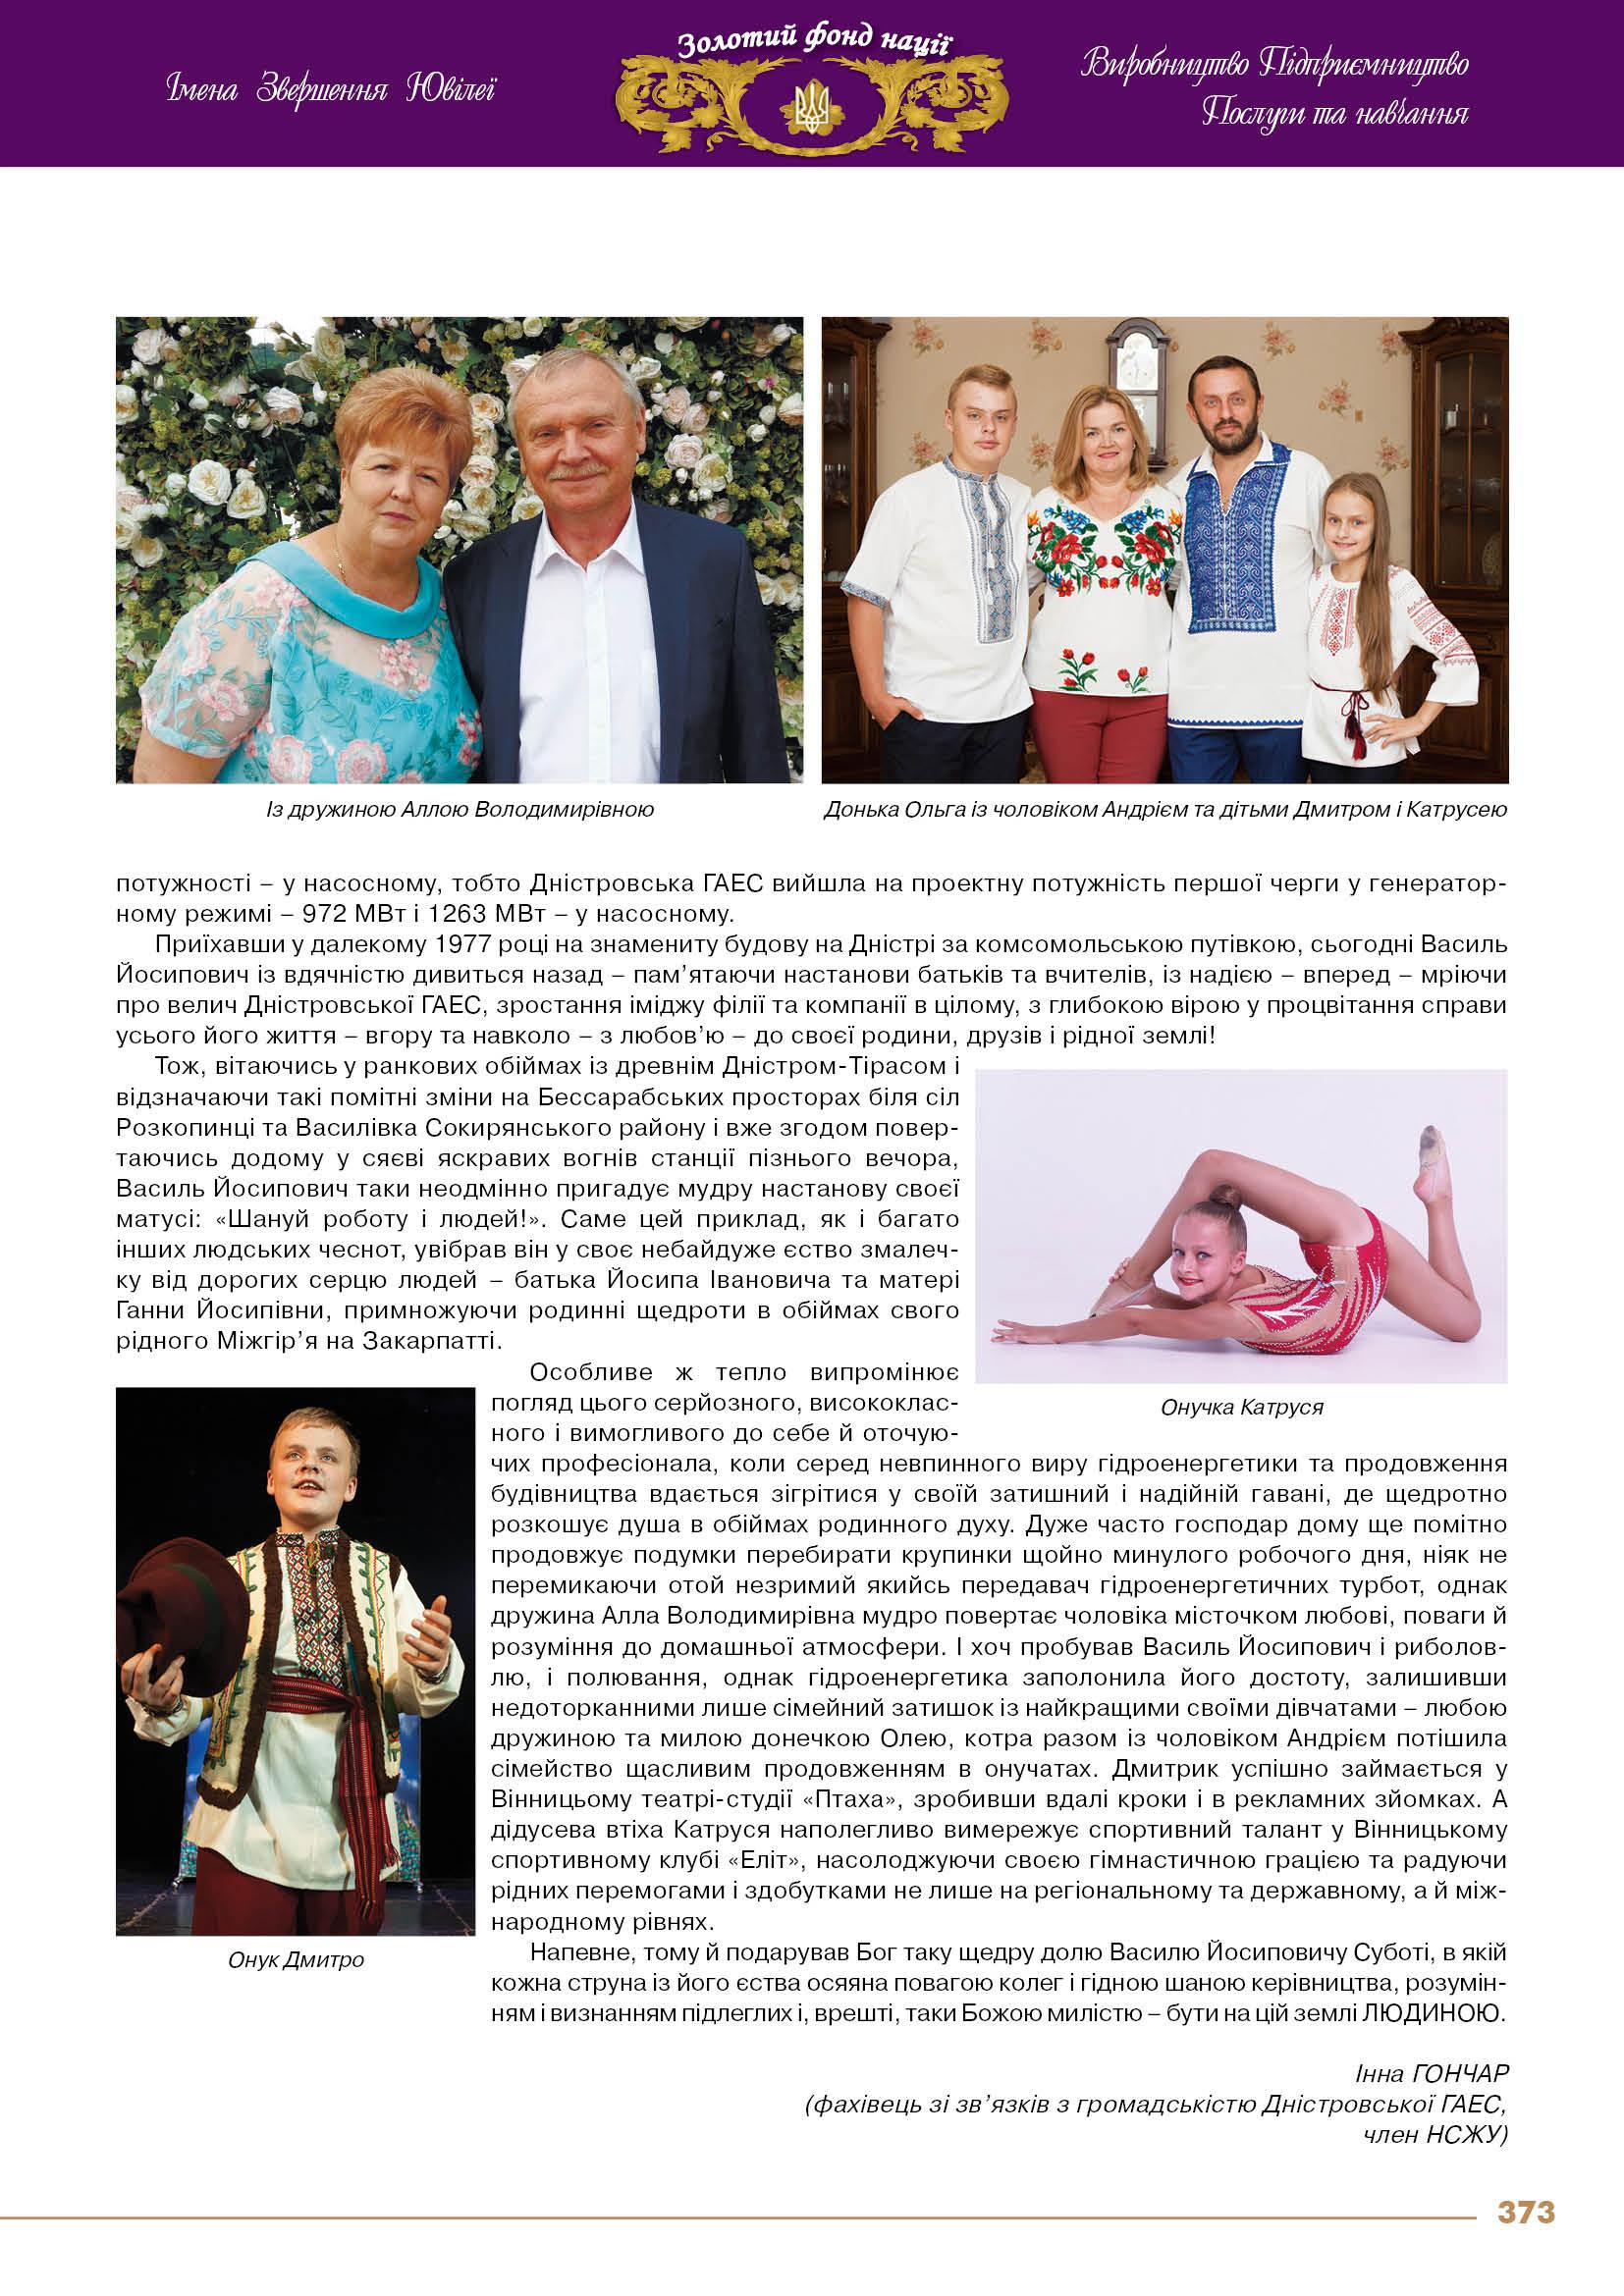 Субота Василь Йосипович